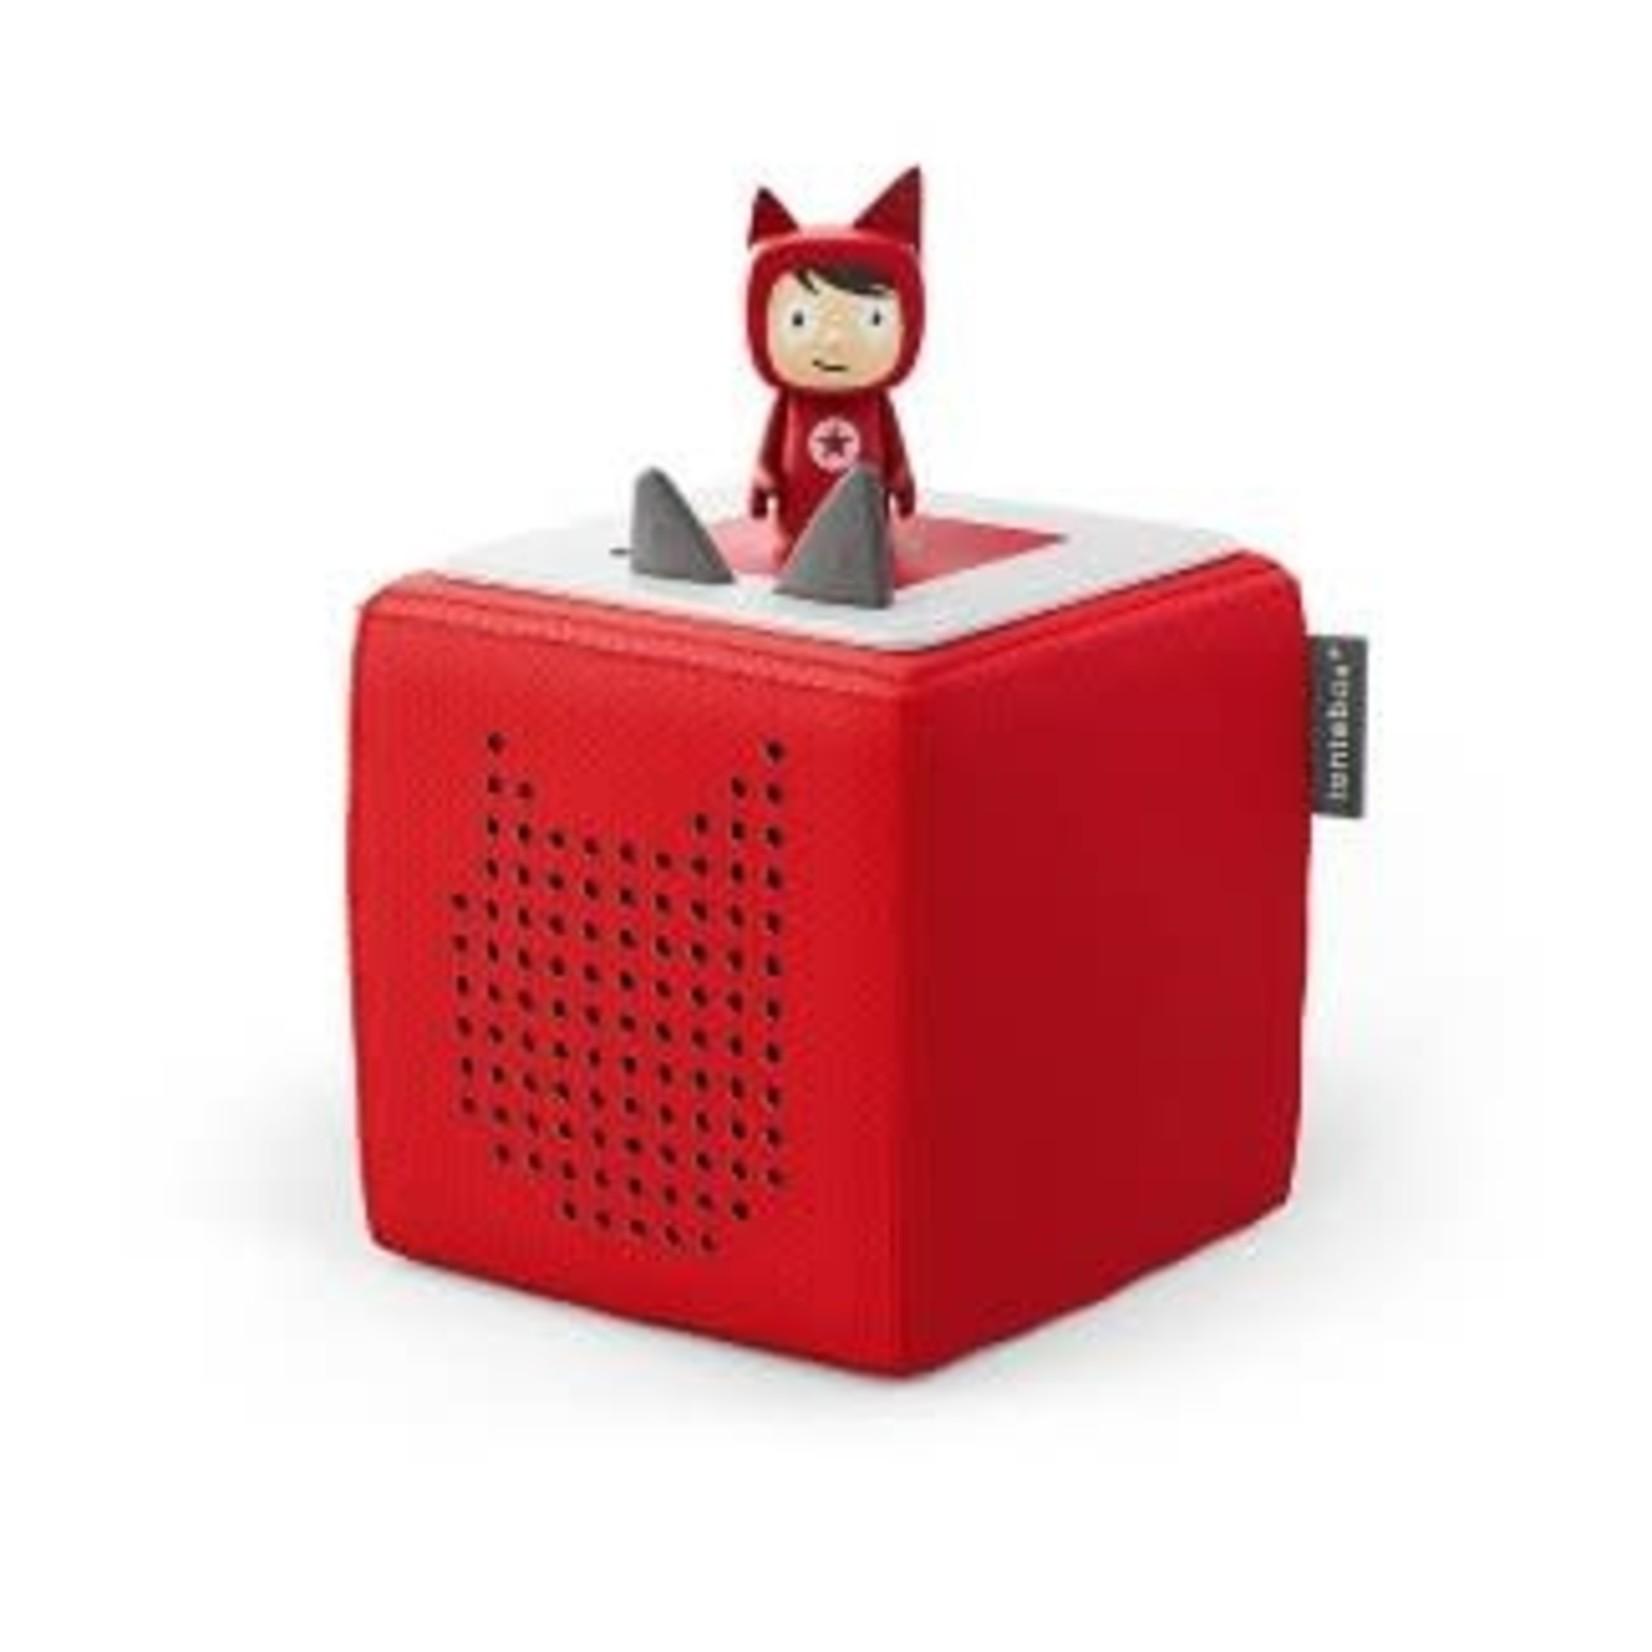 Toniebox Audio Player Starter Set + 2 Bonus Tonies